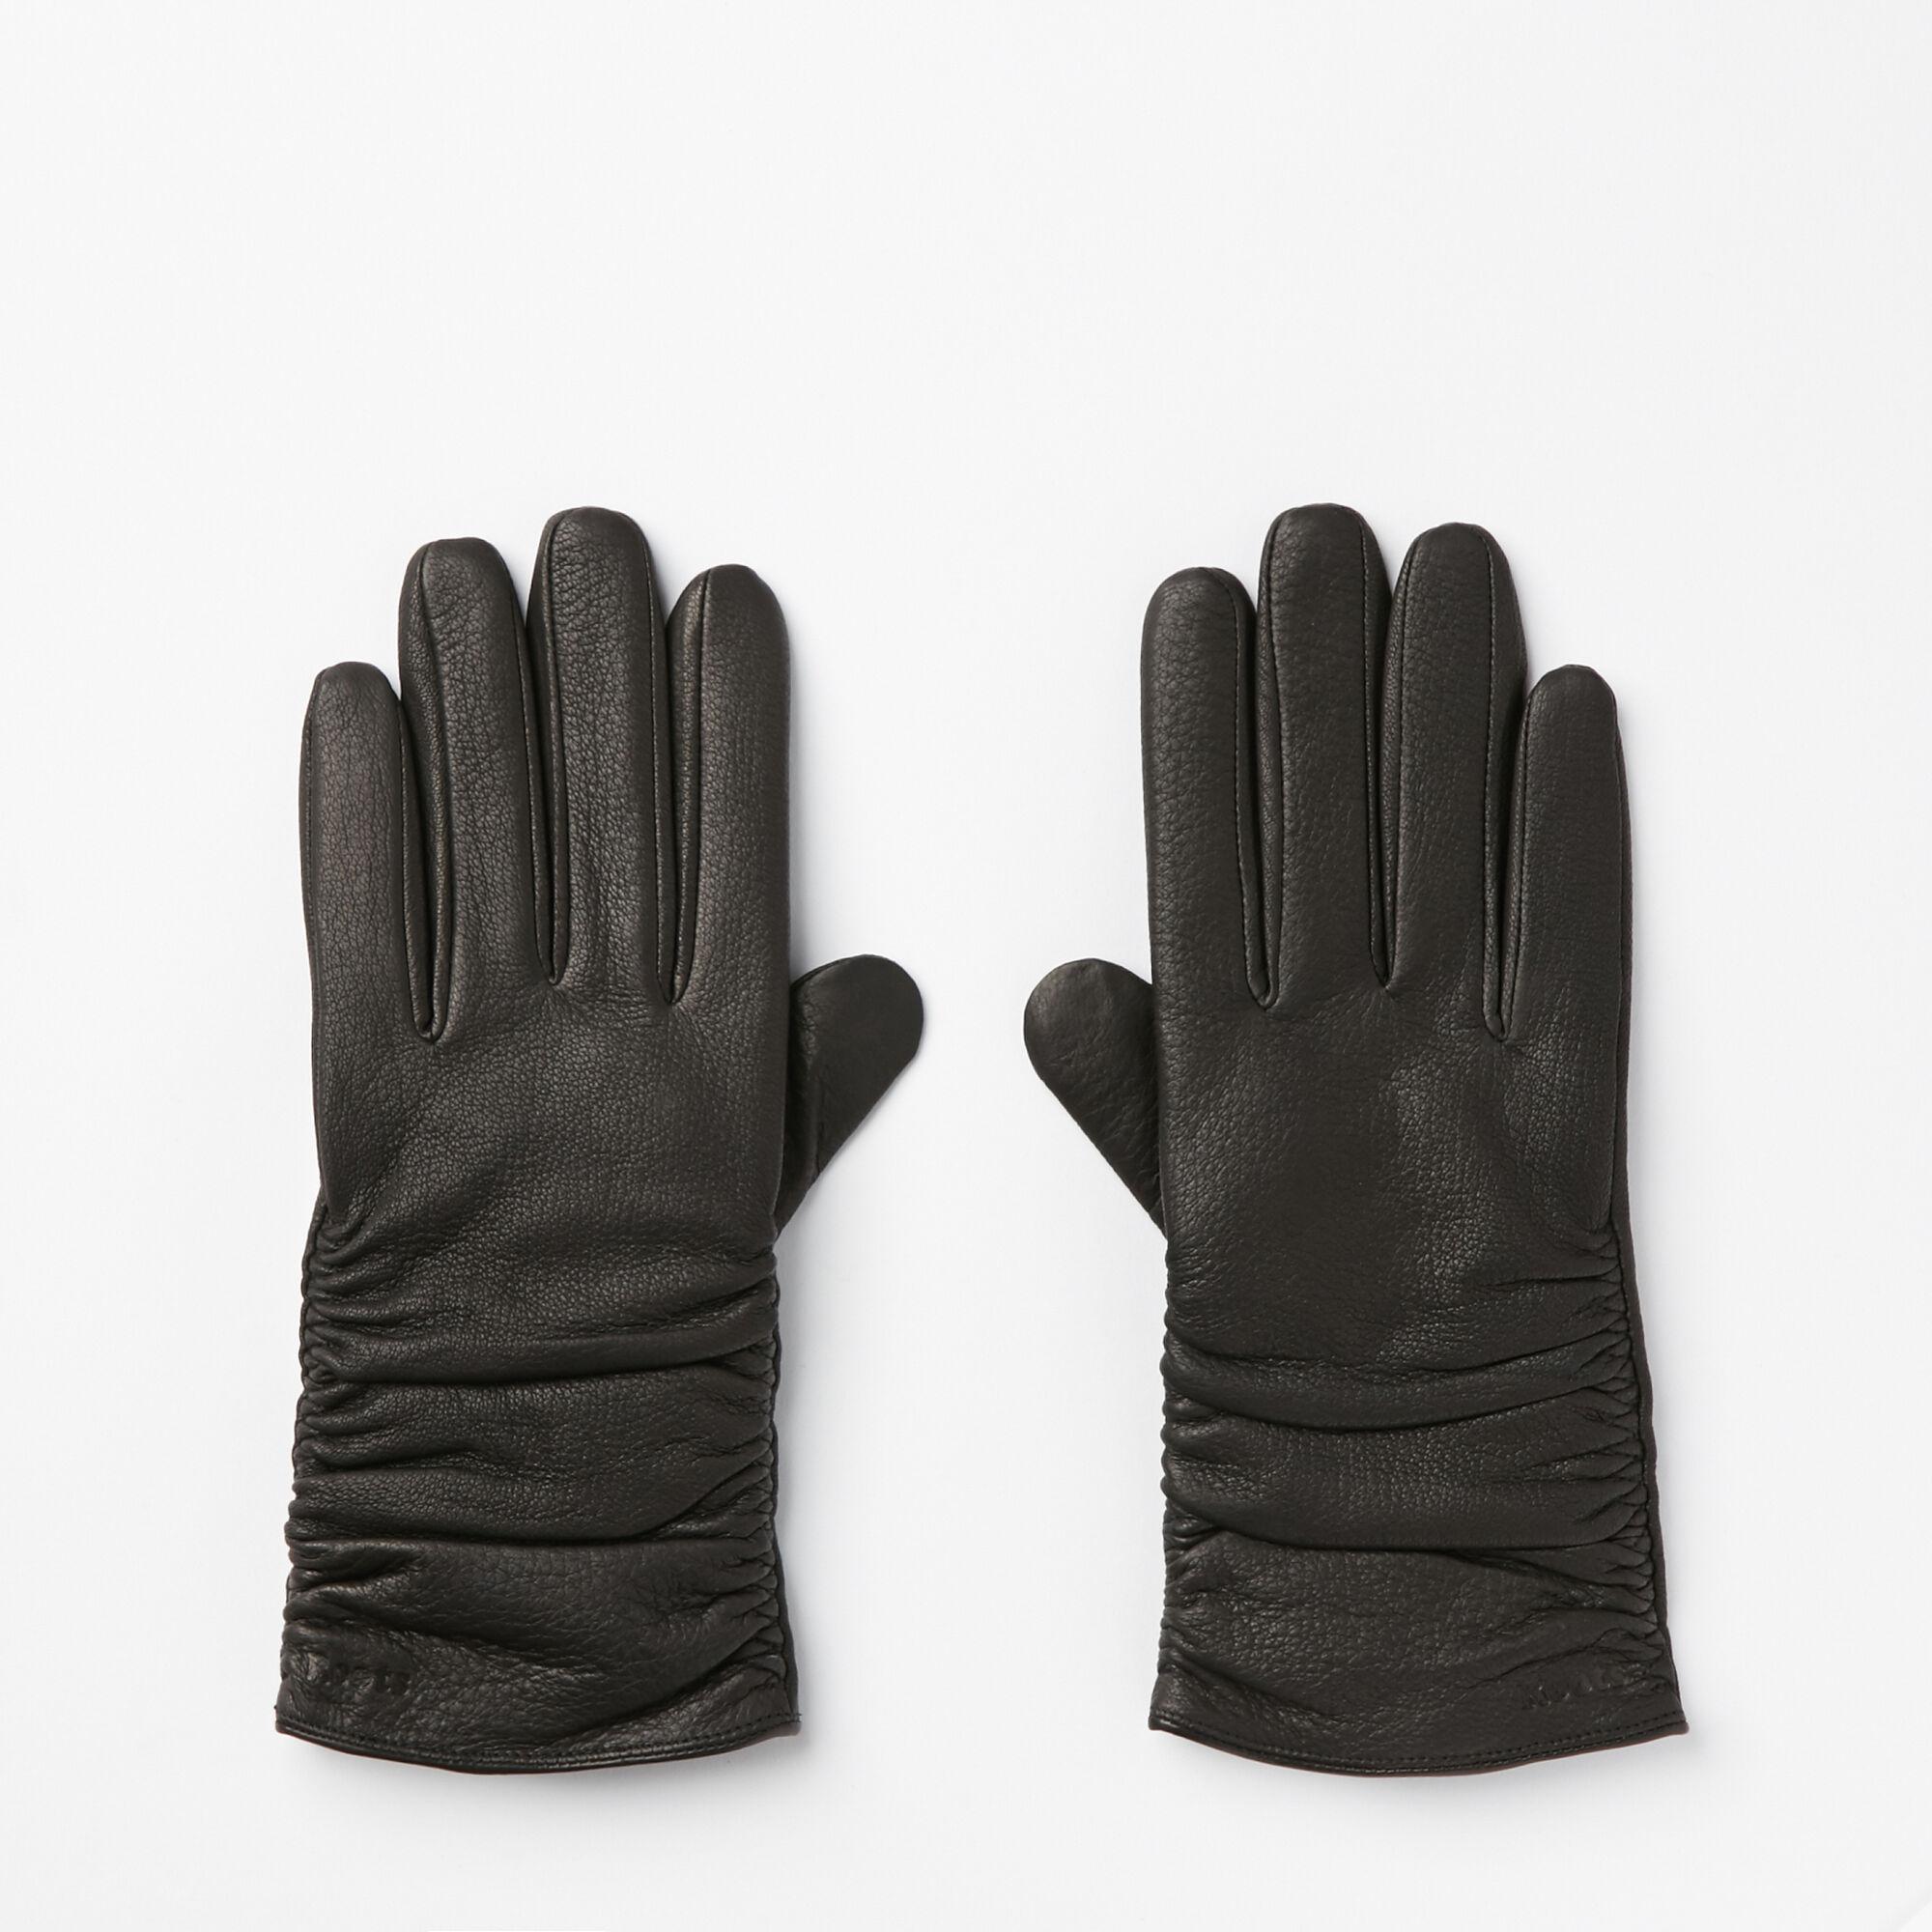 Womens leather gloves toronto - Womens Fashion Deerskin Glove